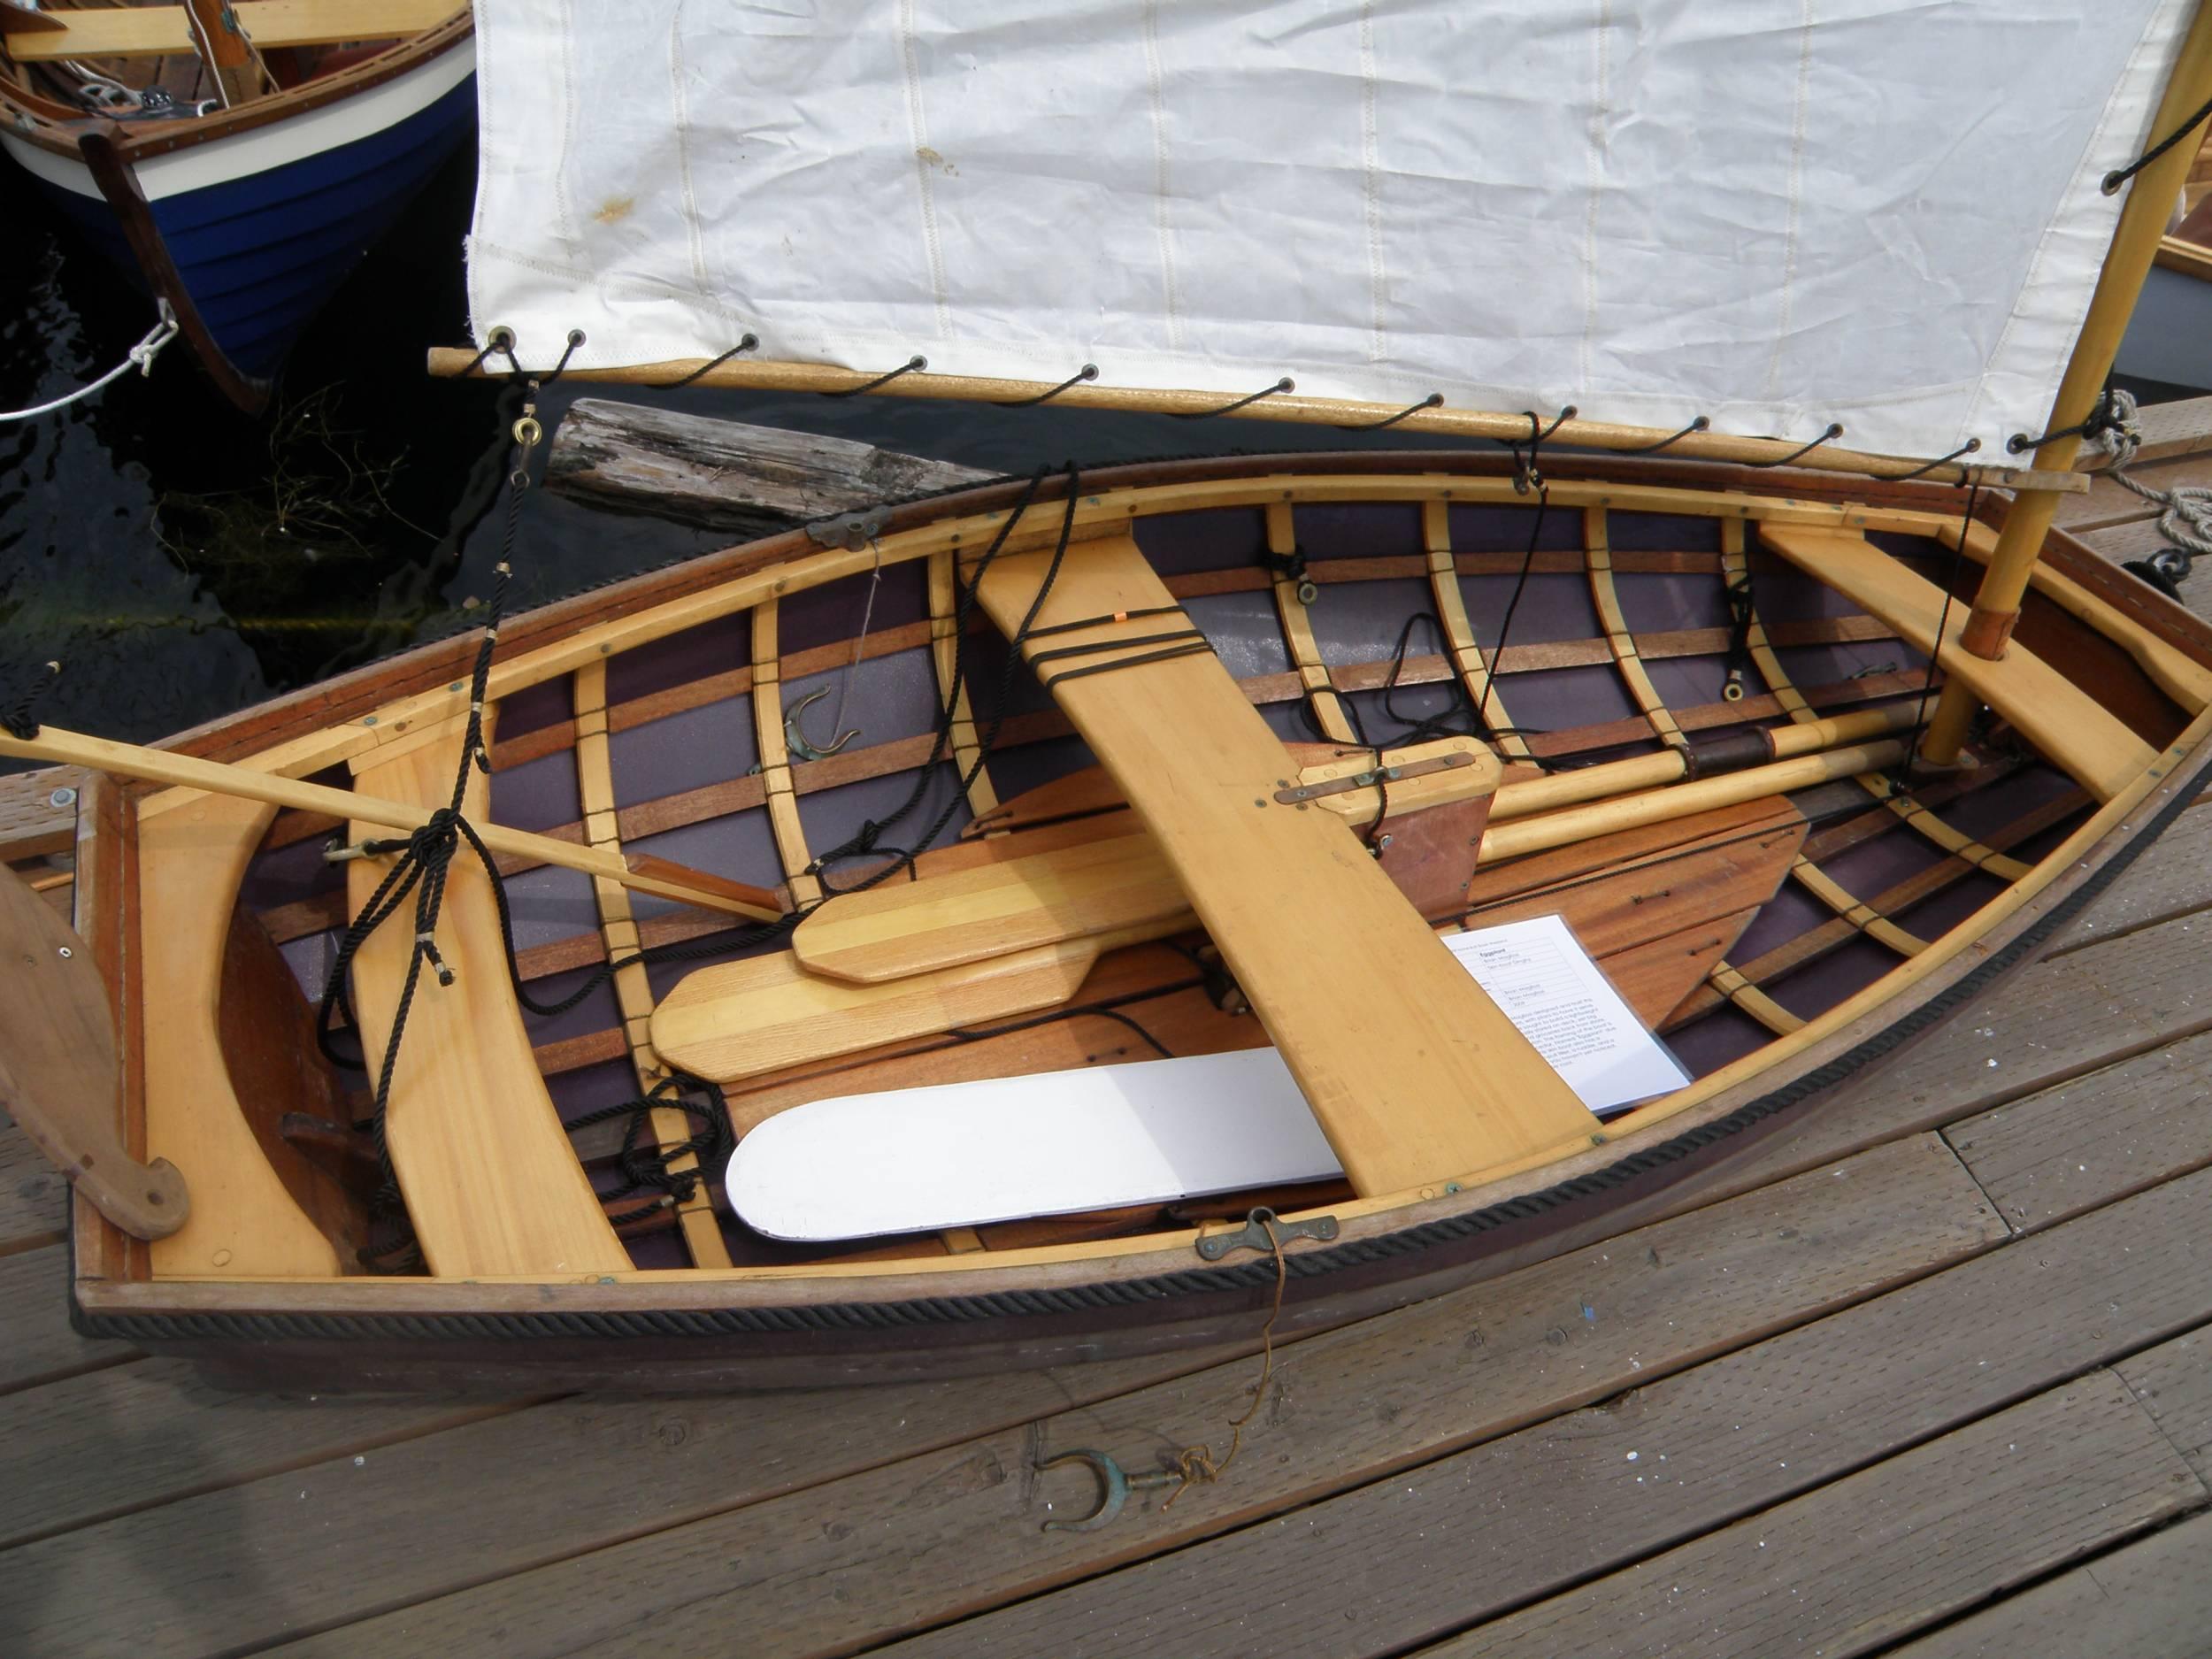 Pram Boat Plans Plywood : Pram sof boat design net